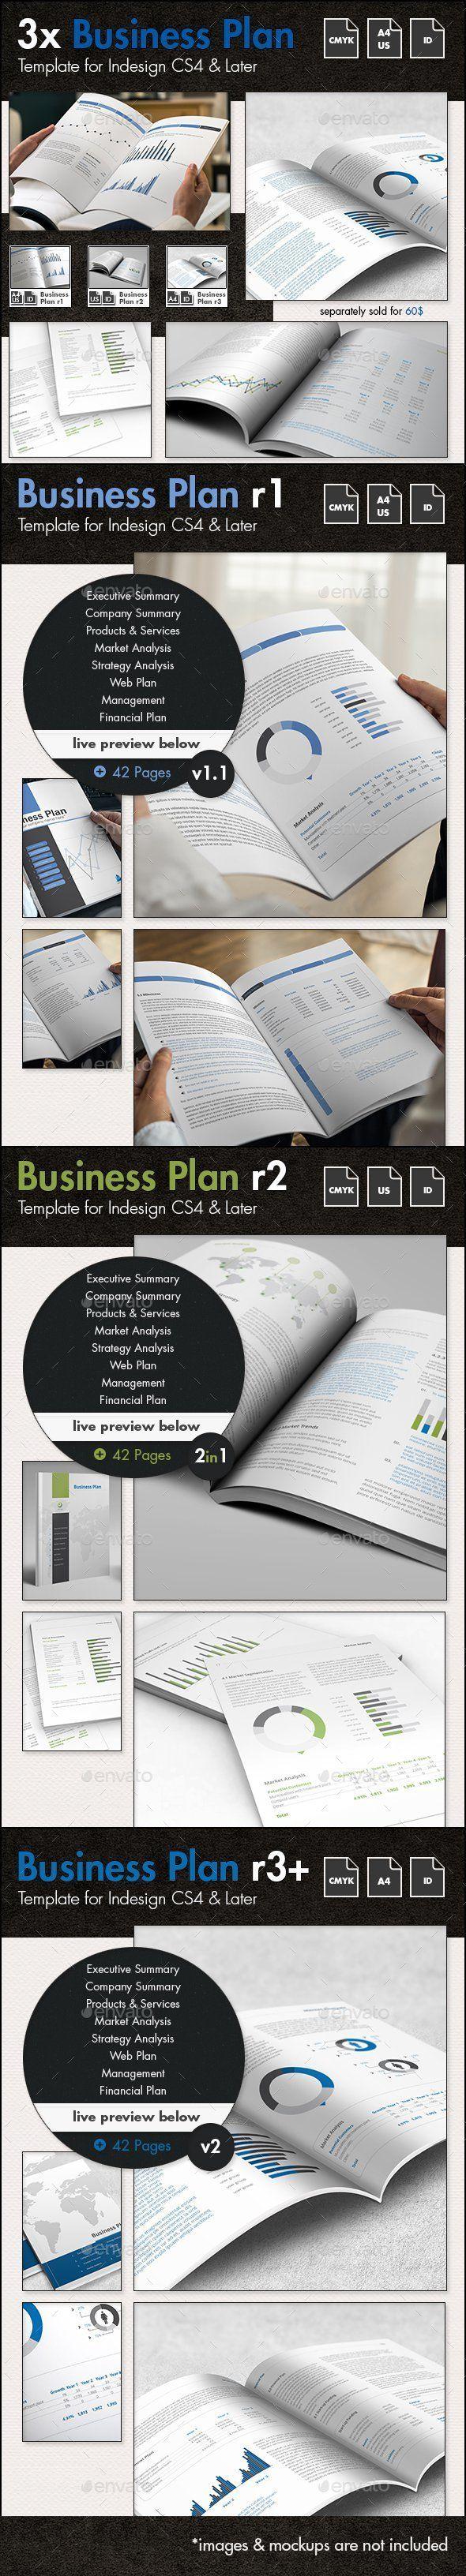 The Business Plan Templates Bundle